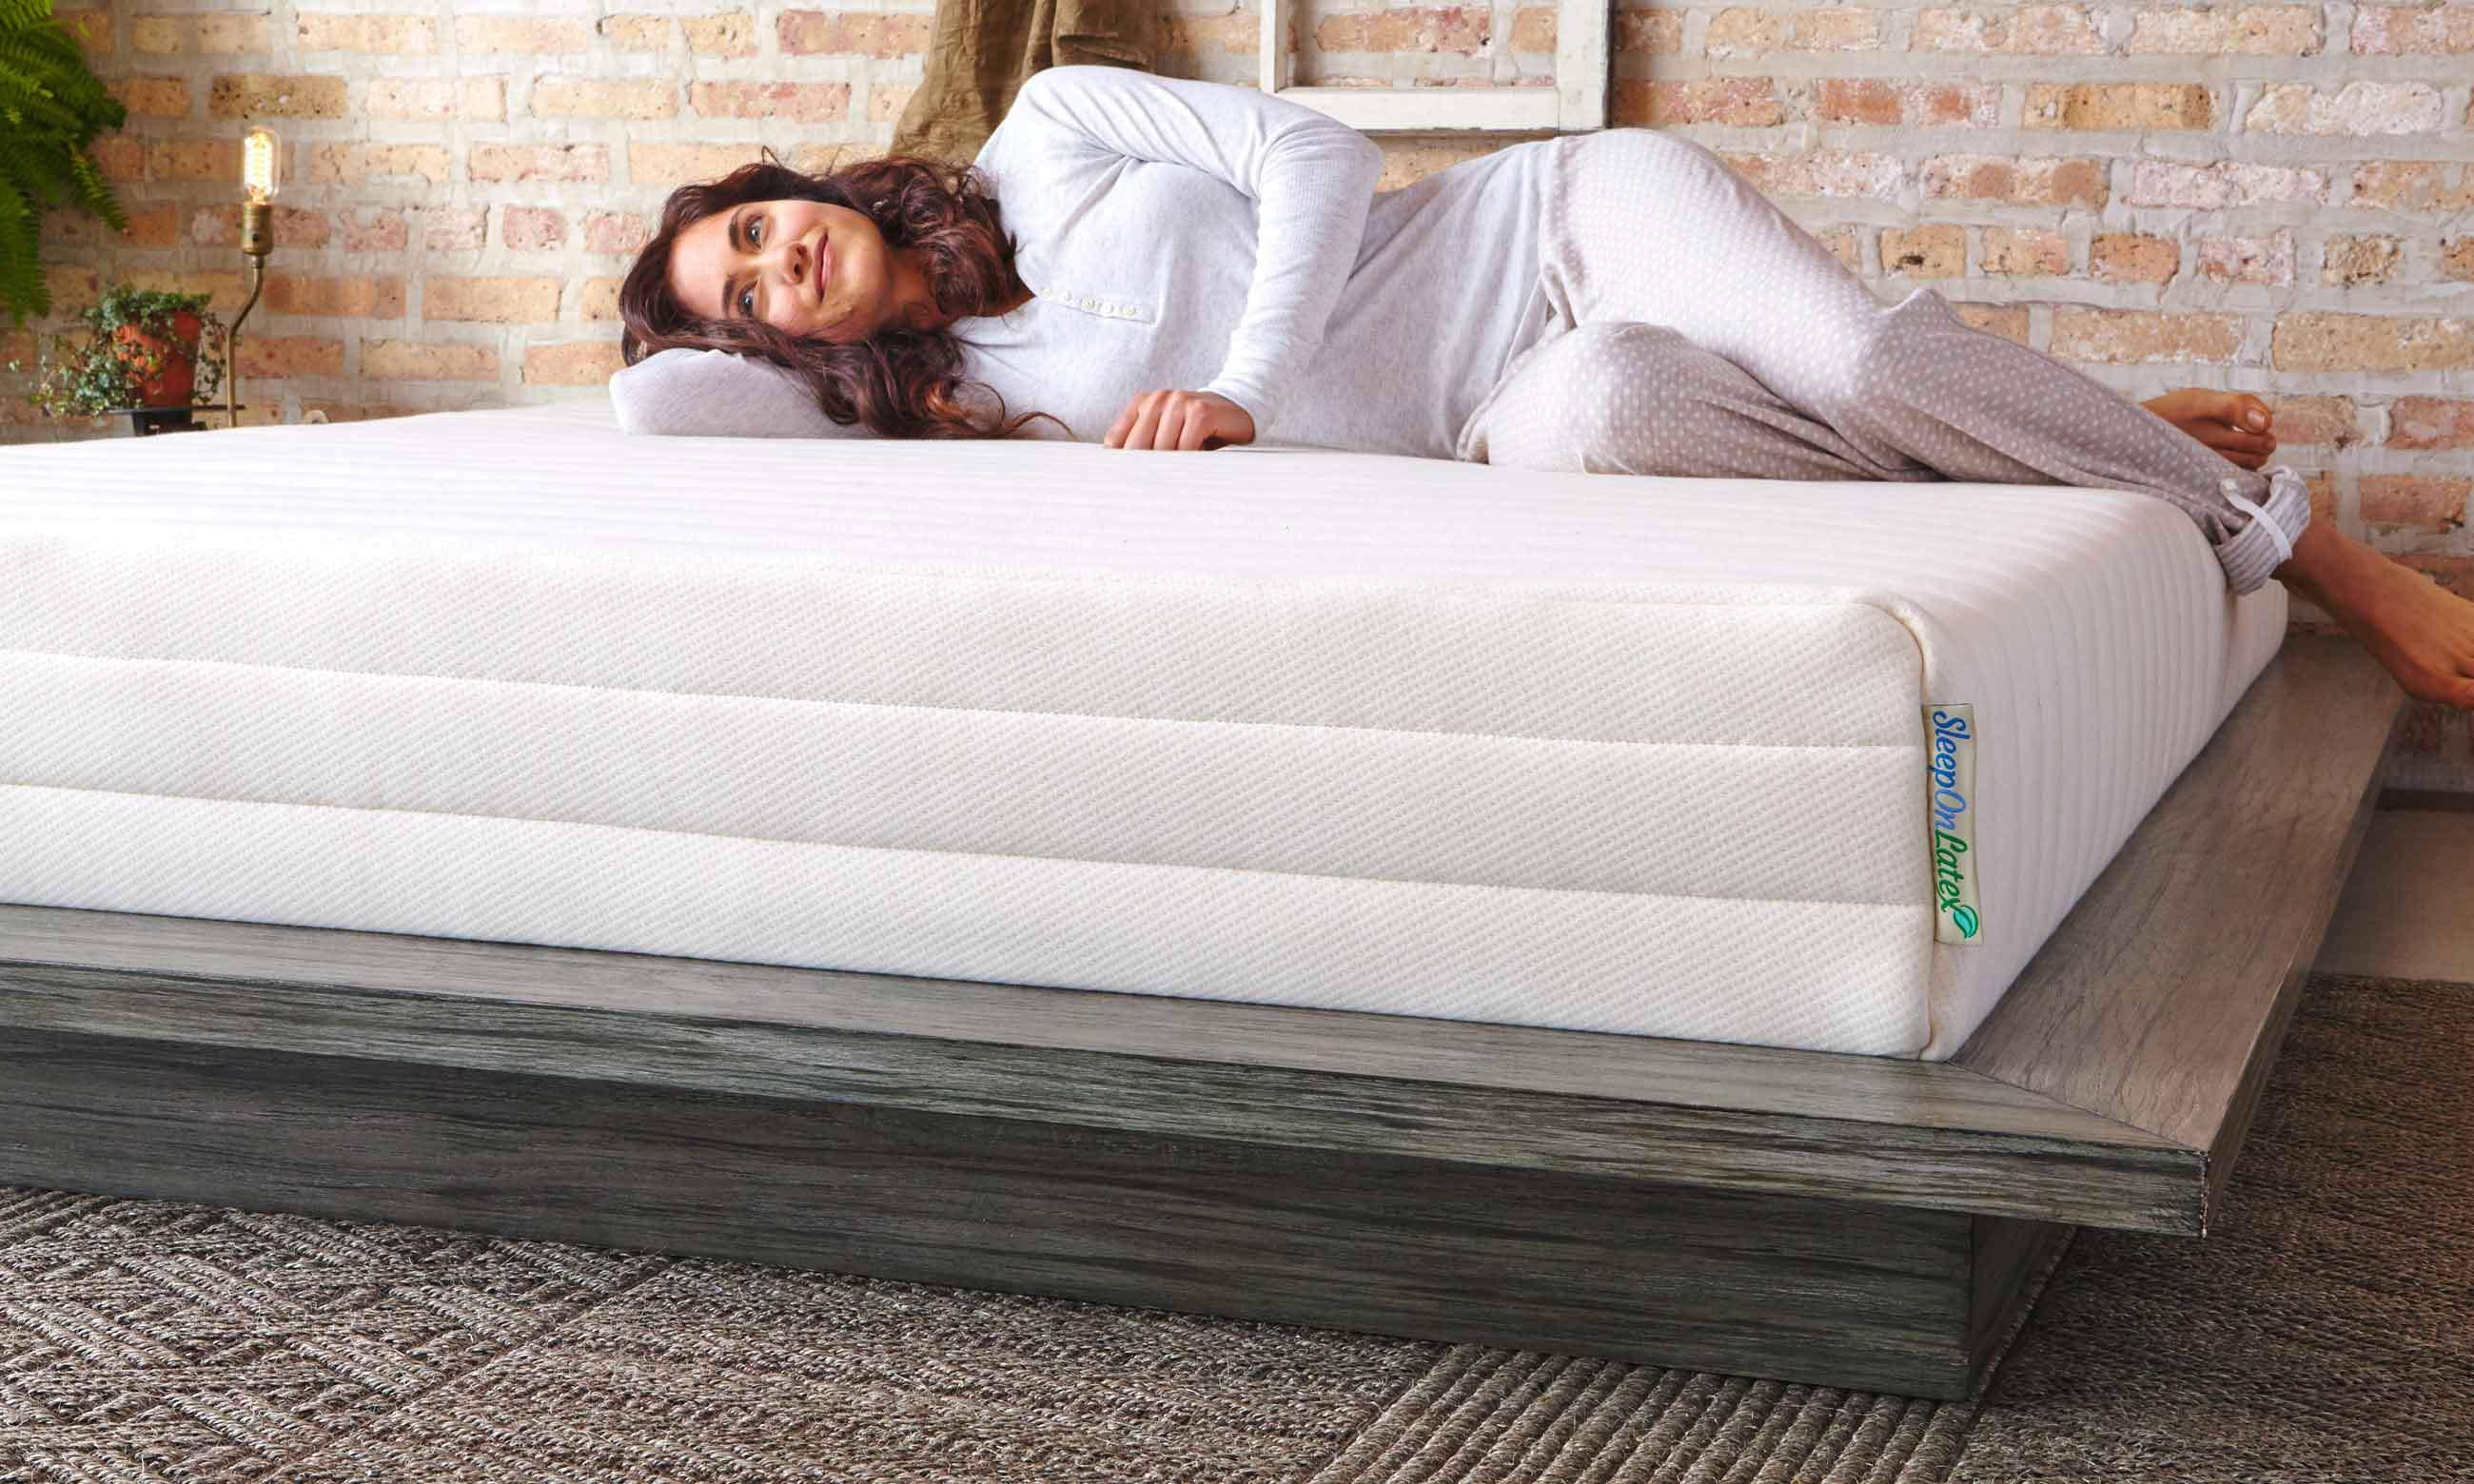 Woman lying down on Pure Green mattress by SleepOnLatex